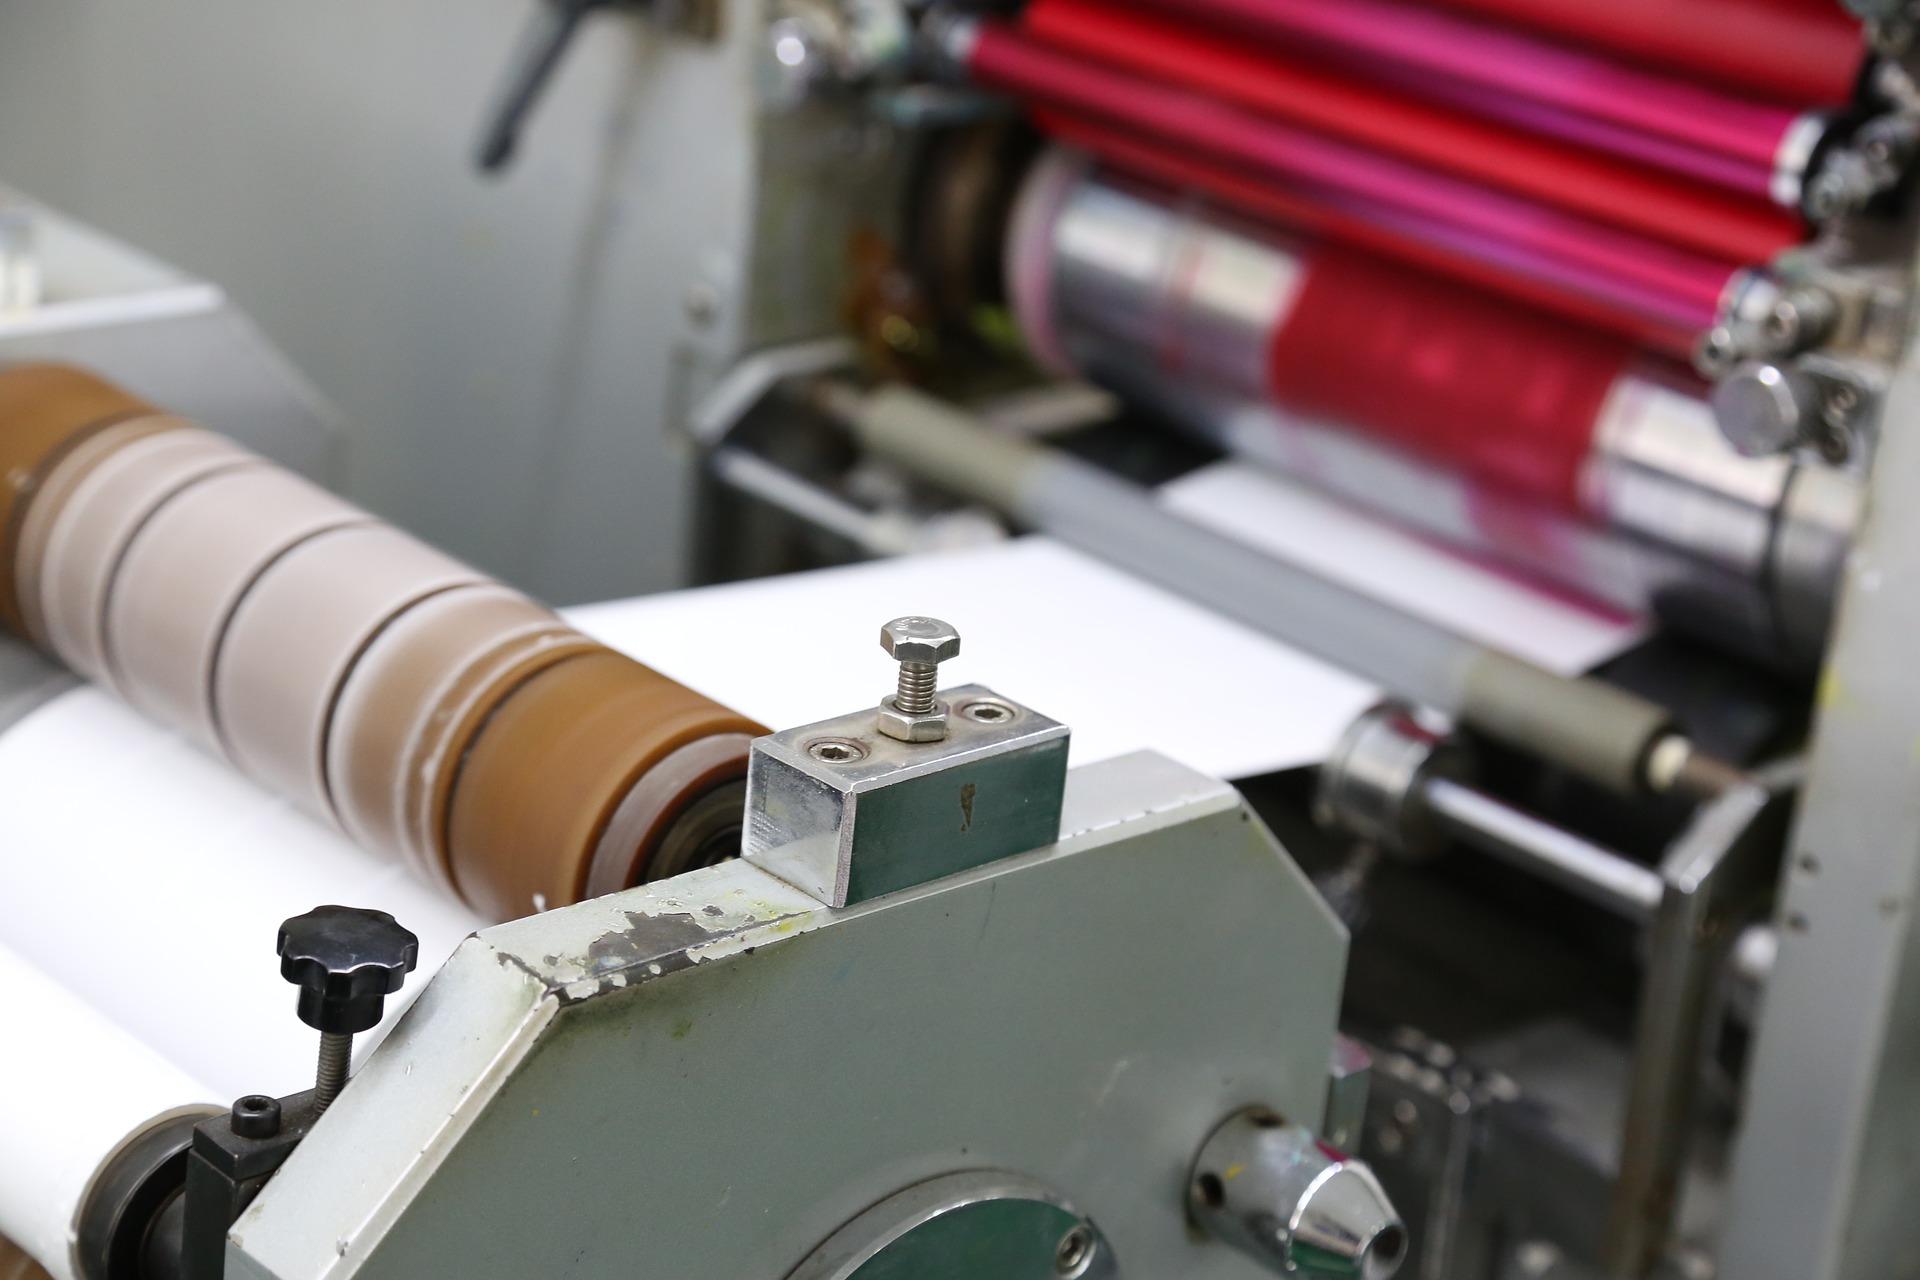 offset-printing-macine-3634411_1920